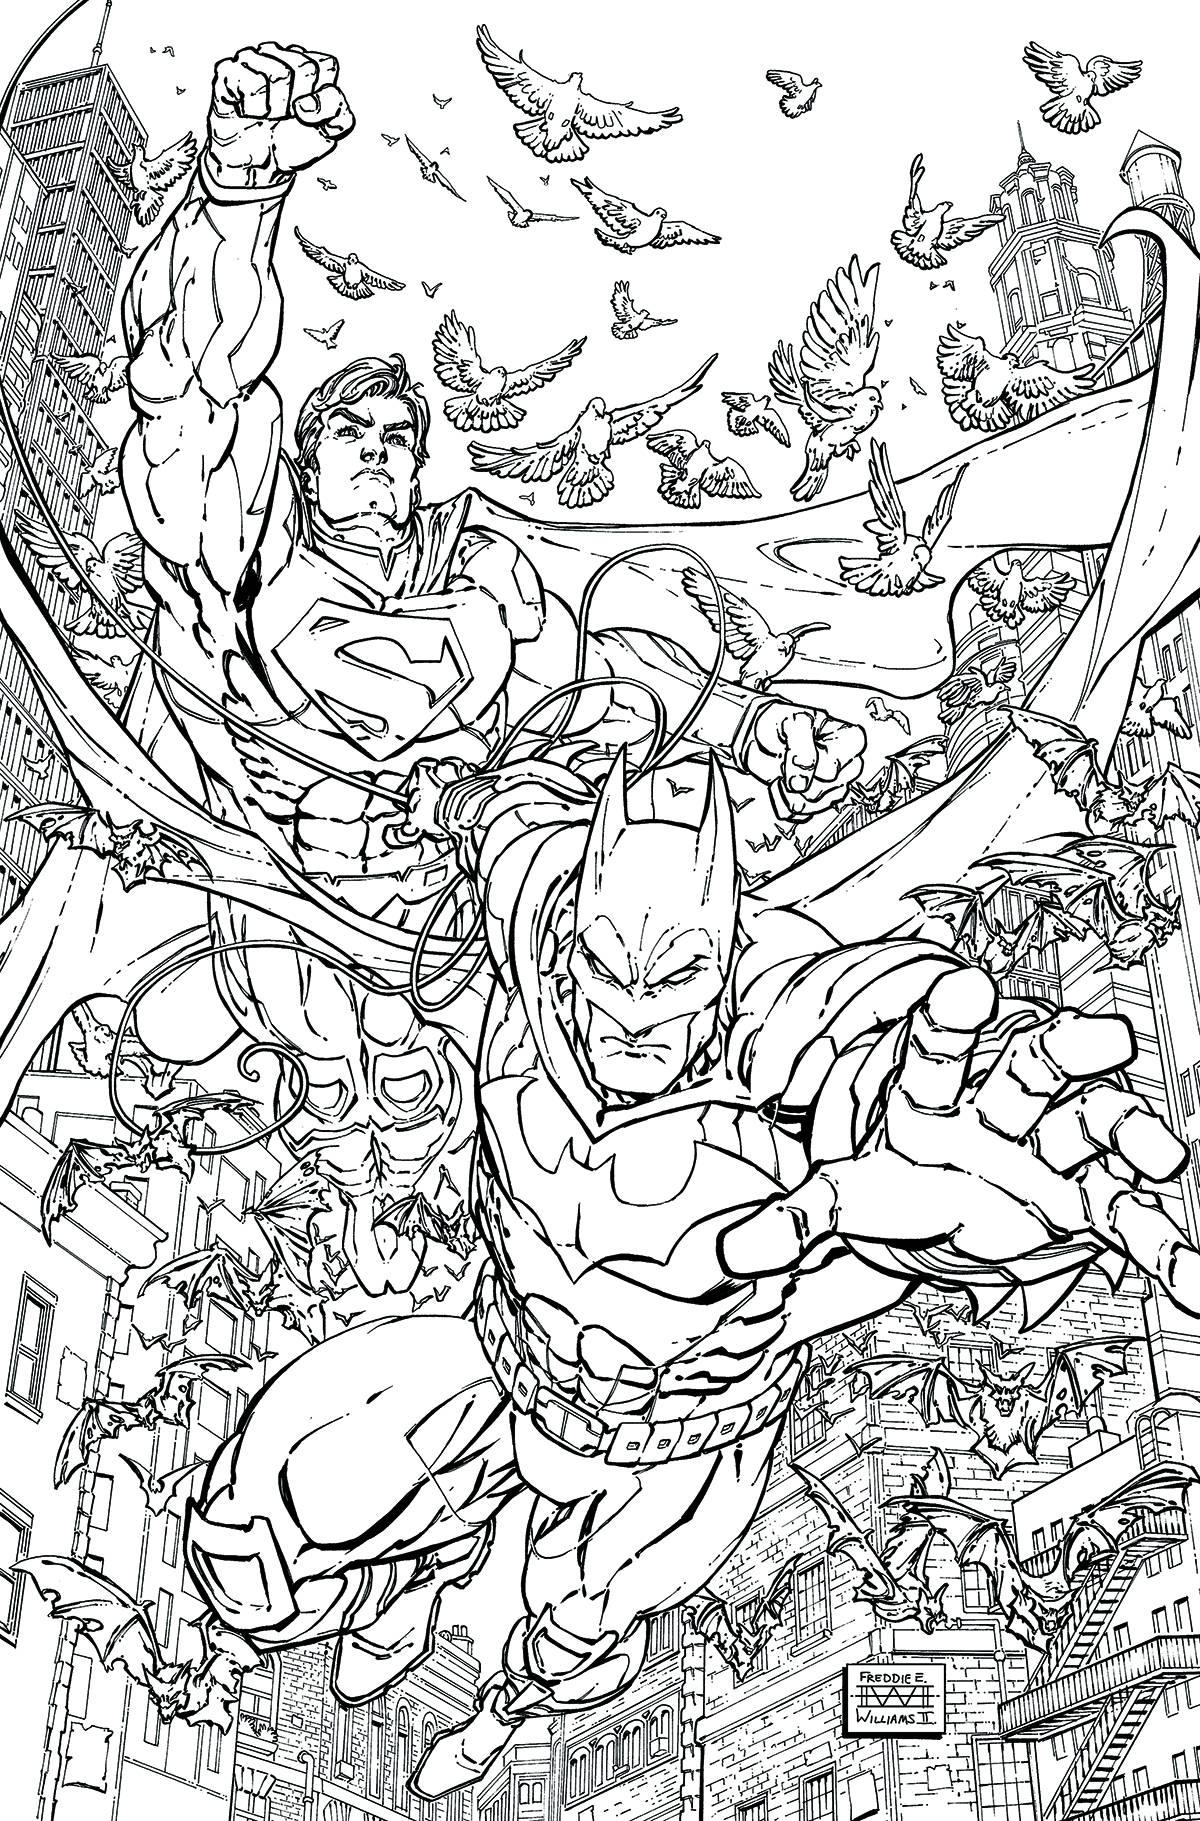 Adult coloring book - Batman Superman 28 Adult Coloring Book Variant Edition Forbiddenplanet Com Uk And Worldwide Cult Entertainment Megastore